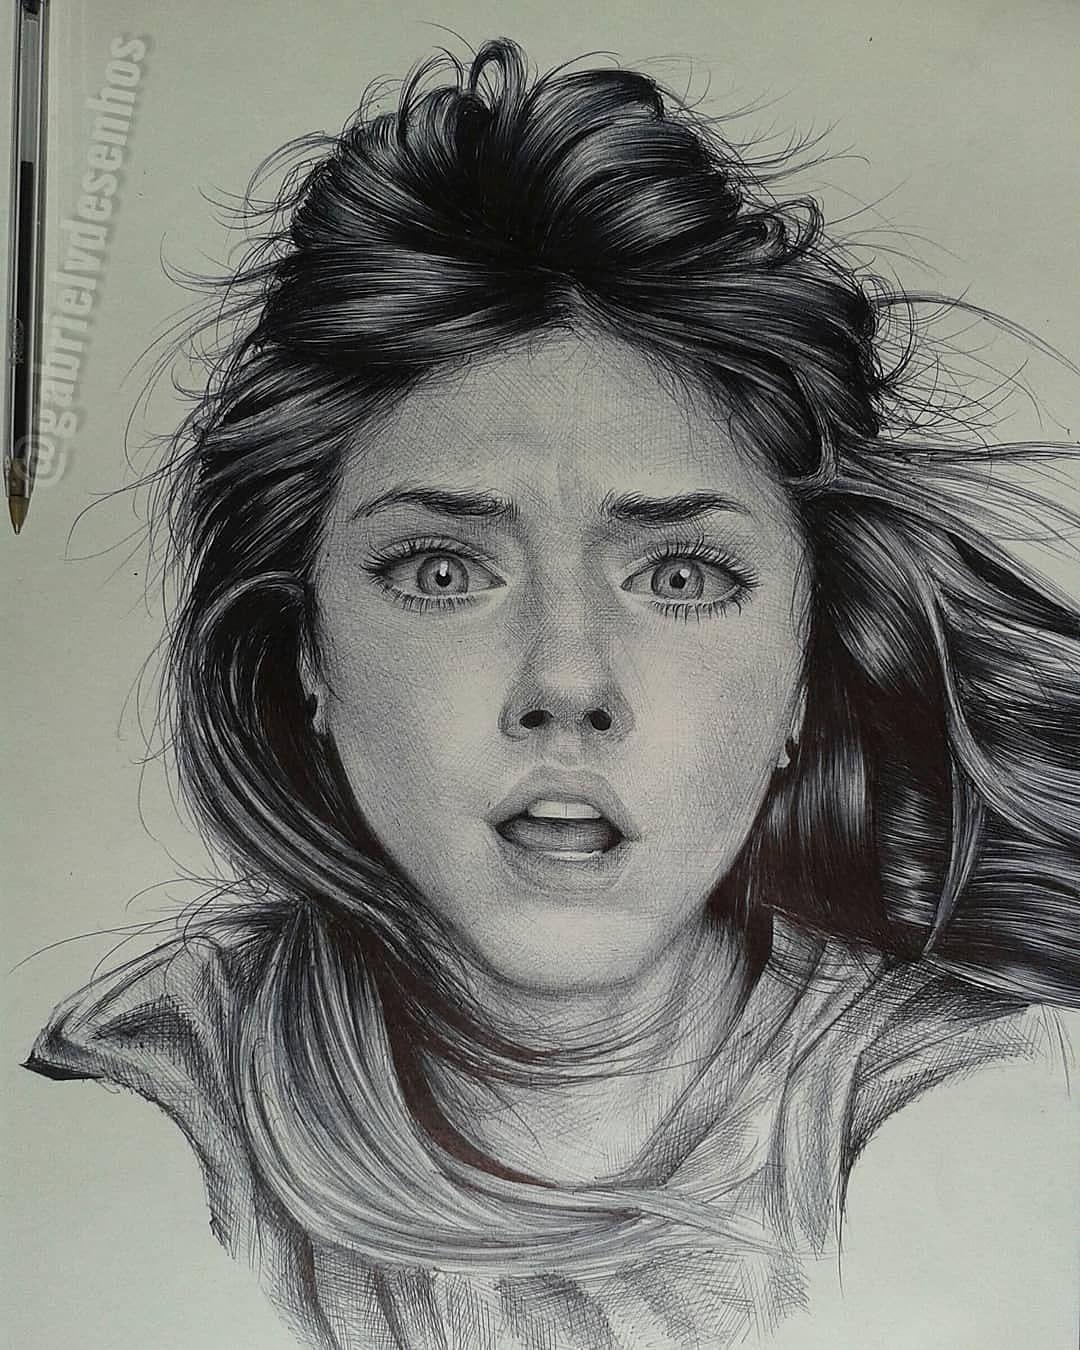 Her Eyes Spoke For Her Swipe Art By At Gabrielvdesenhos